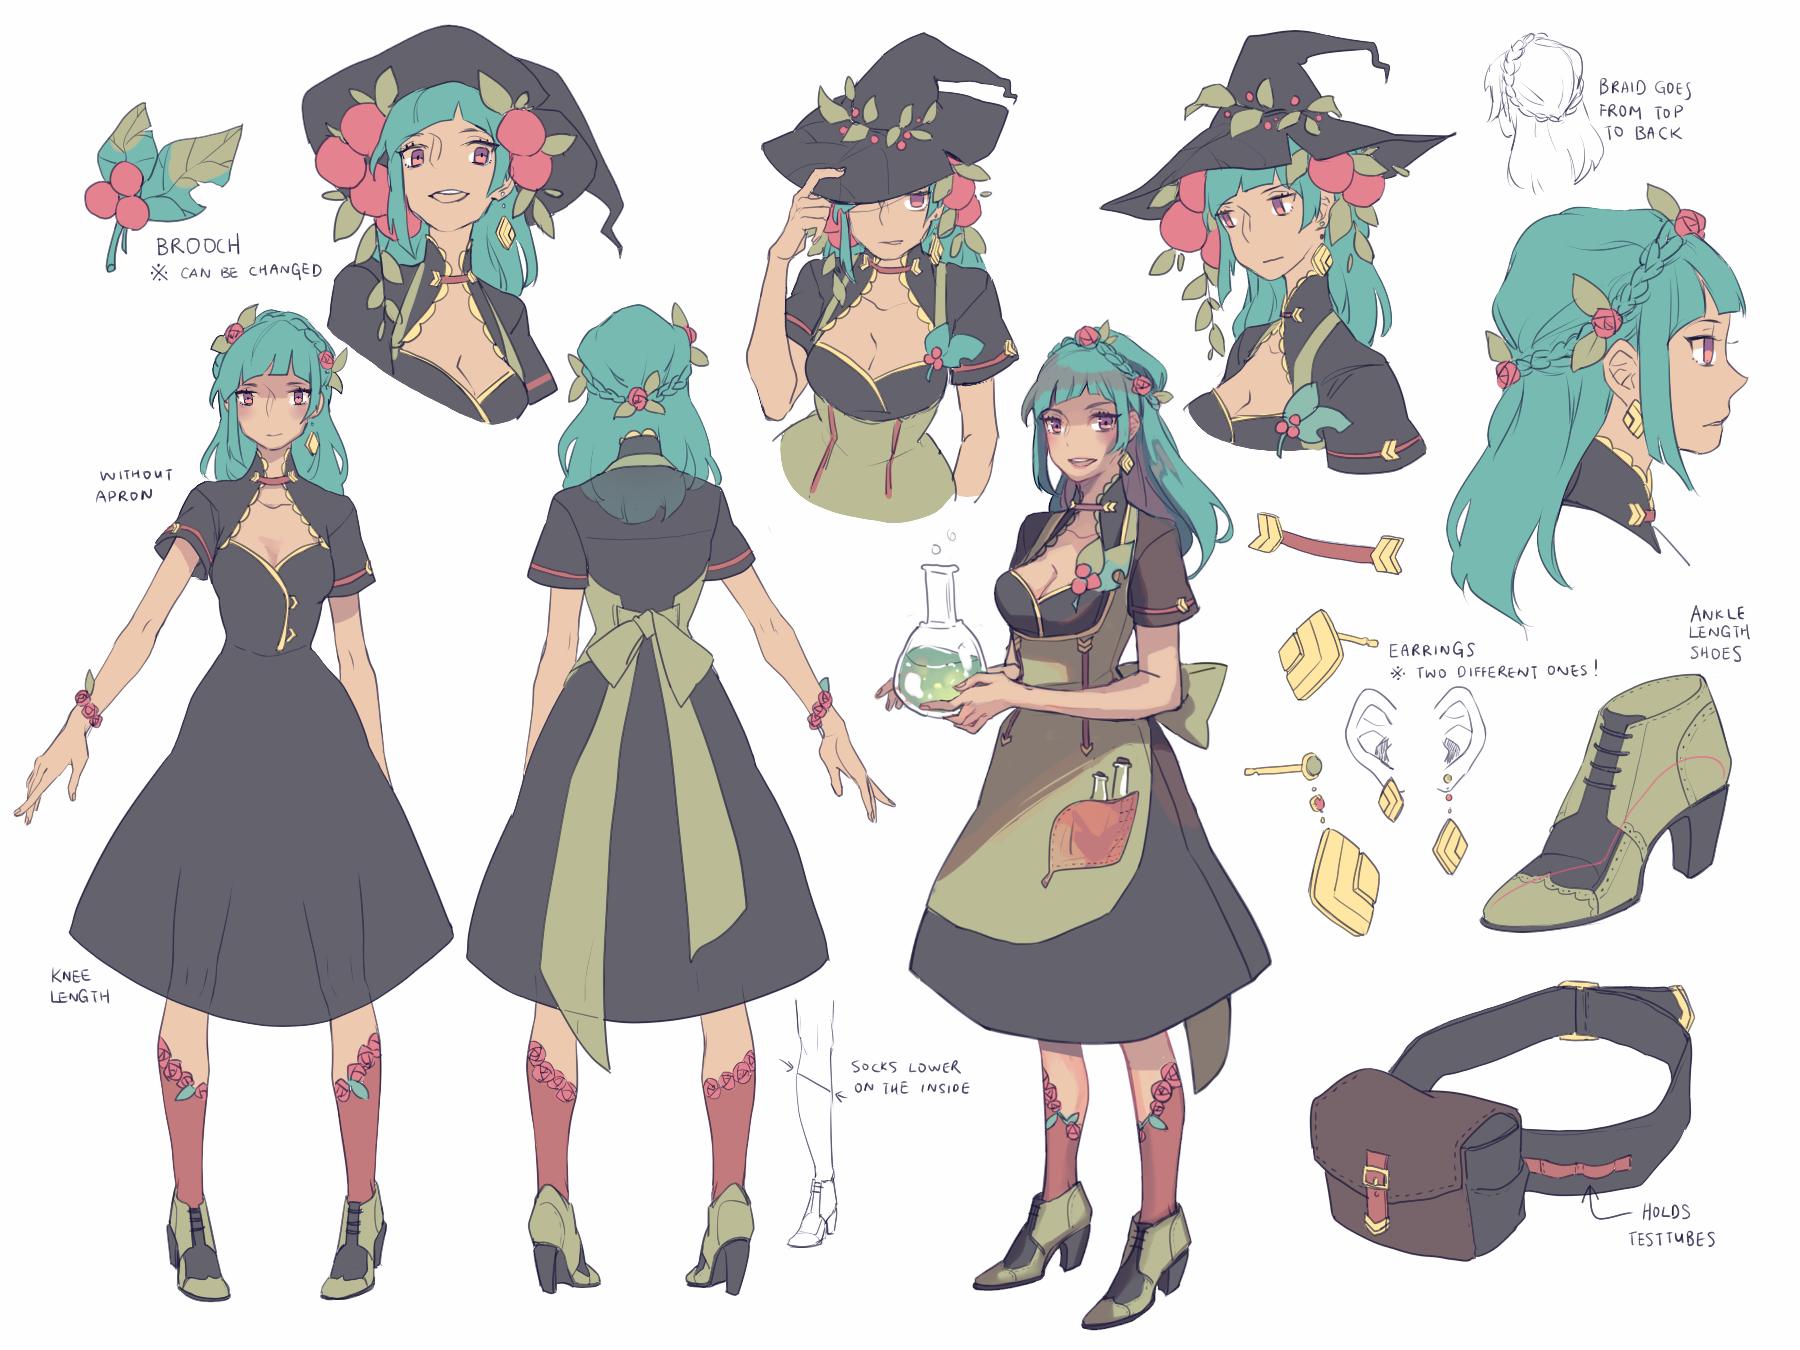 Character Design An Artist Resource : Ee lucie ref by onedayfour on deviantart